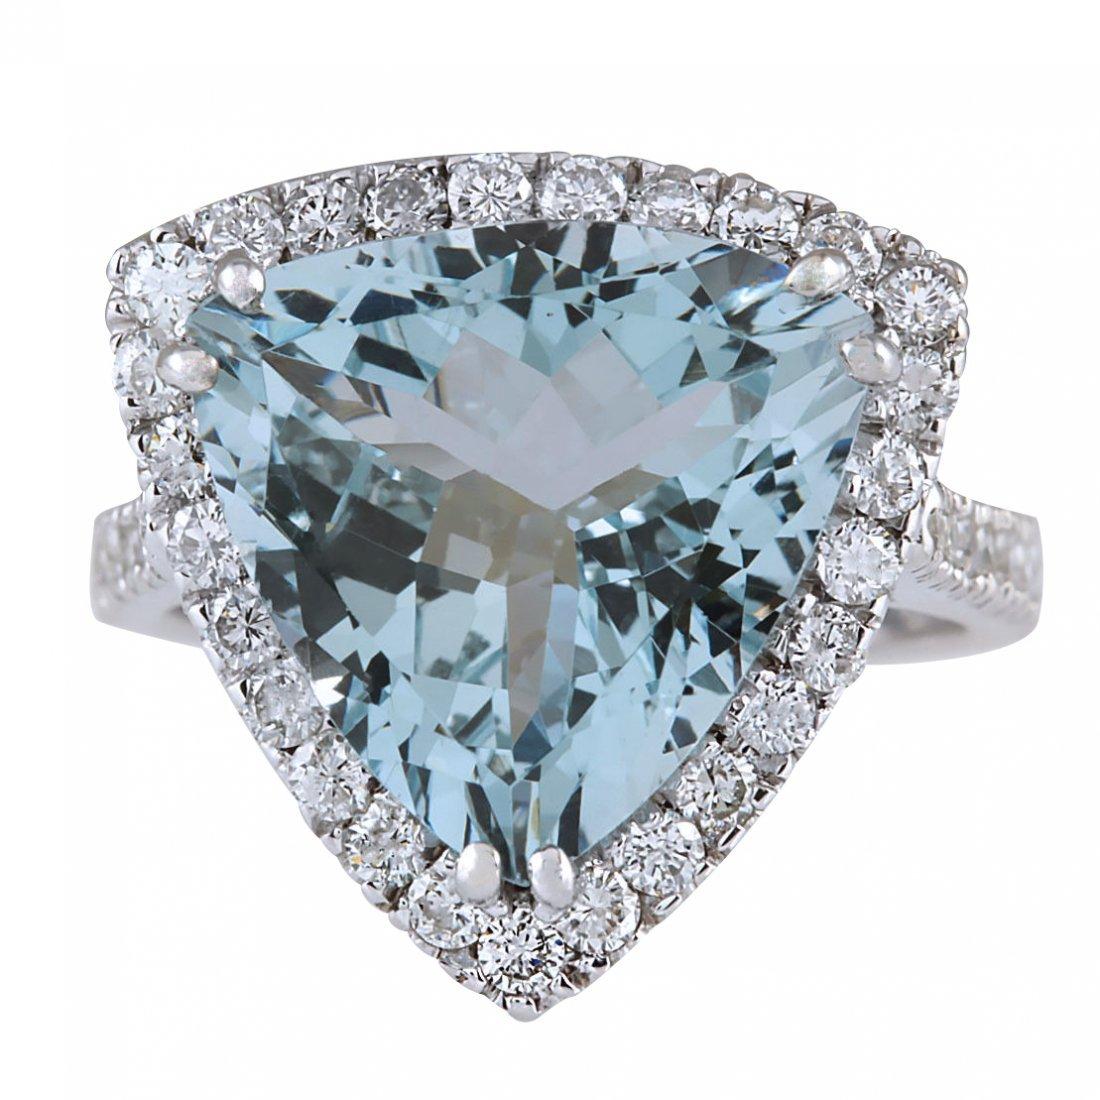 8.96CTW Natural Aquamarine And Diamond Ring In 14K